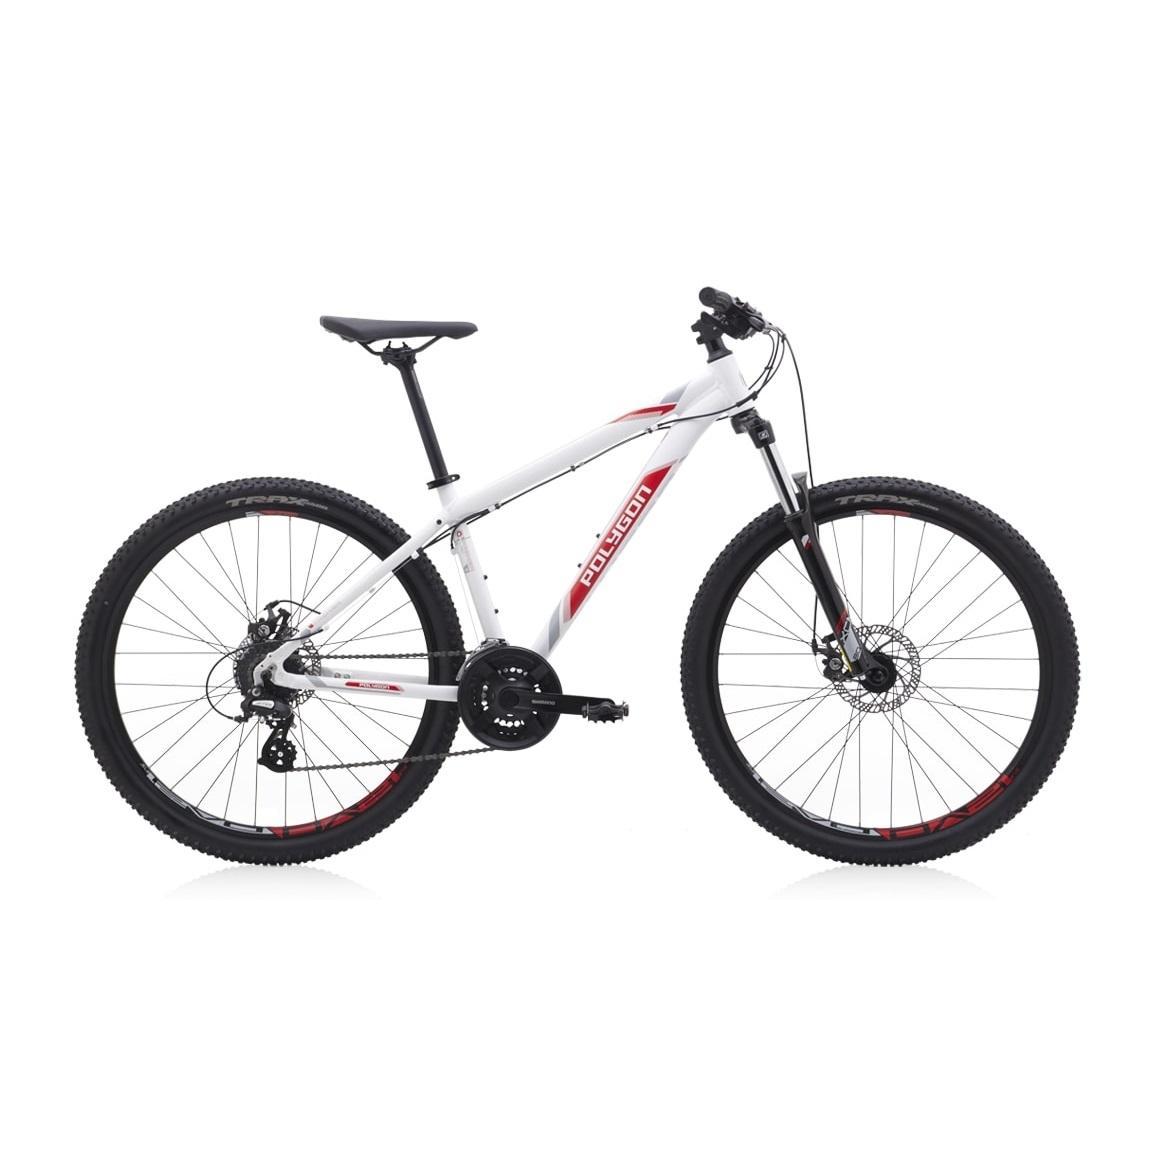 Cycle Price in Nepal - Buy Bicycle Online - Daraz.com.np